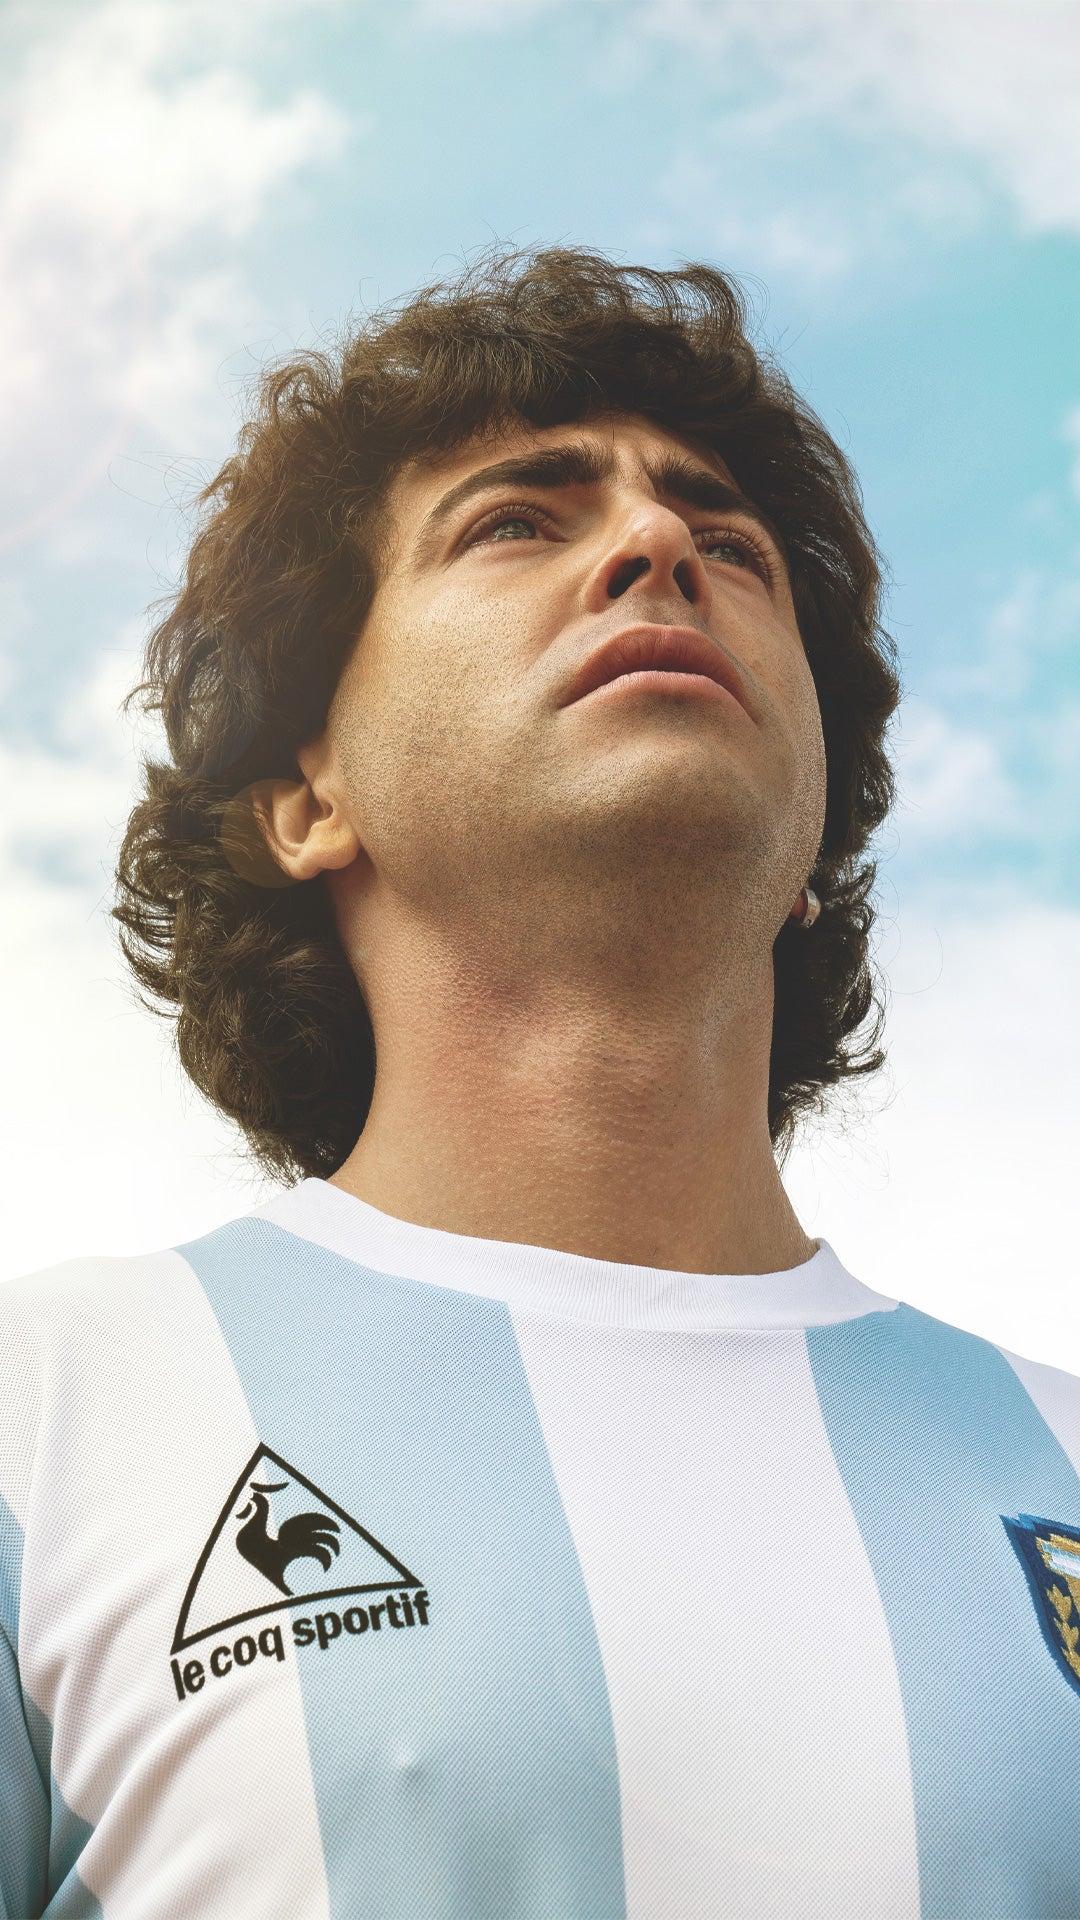 Nazareno Casero interpreta Maradona en su mejor etapa como futbolista.